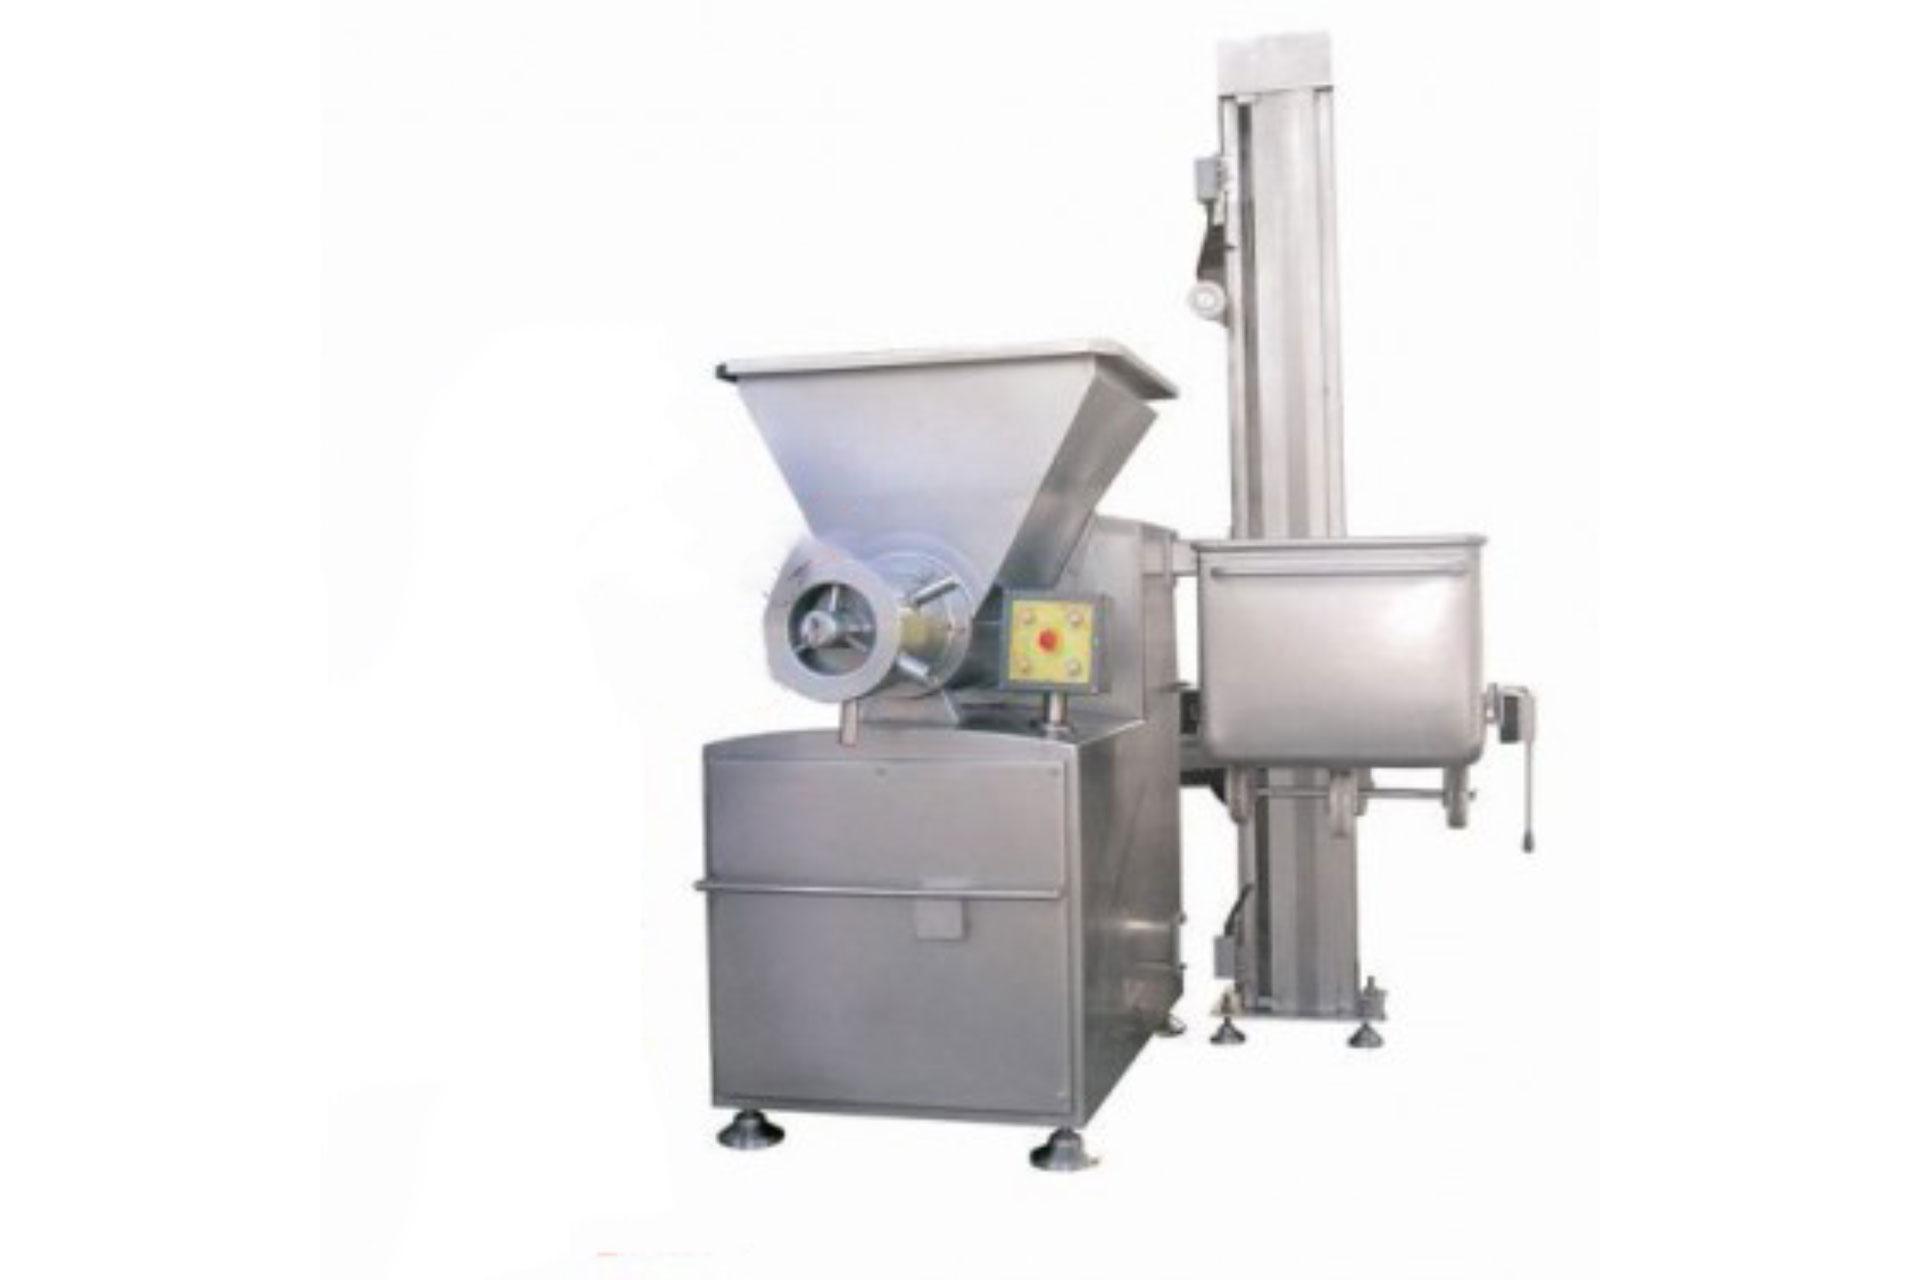 FMG-200 FMG-Series Frozen Meat Grinders